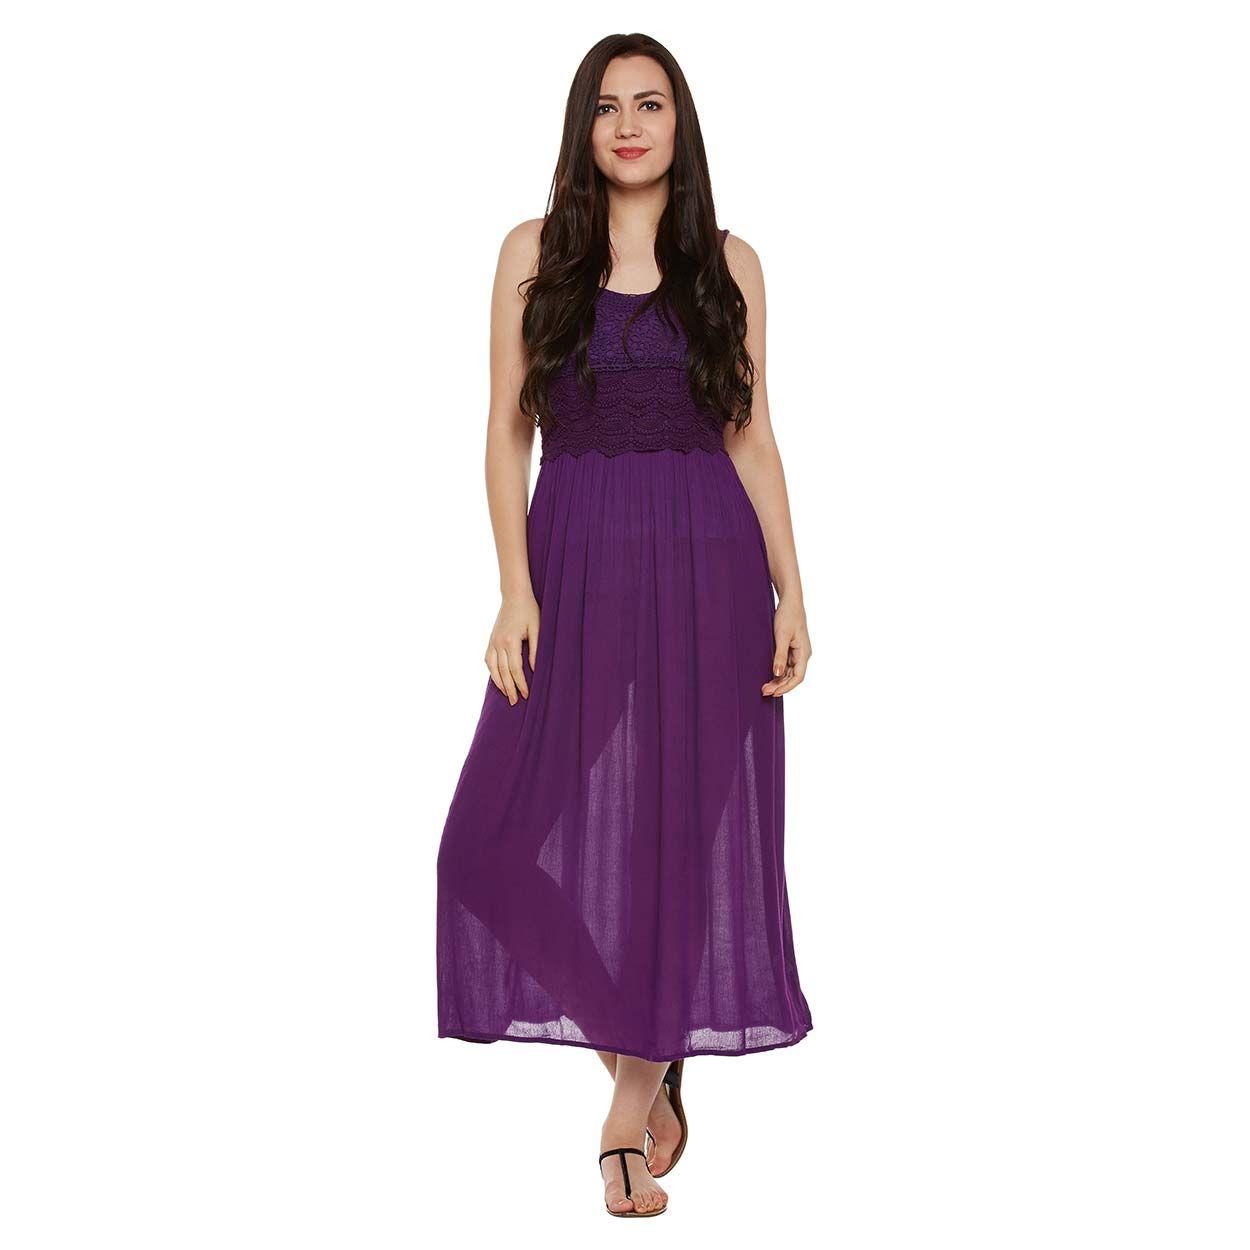 8ec9c644f8e6 Buy Oxolloxo Purple Lace Midi Dress